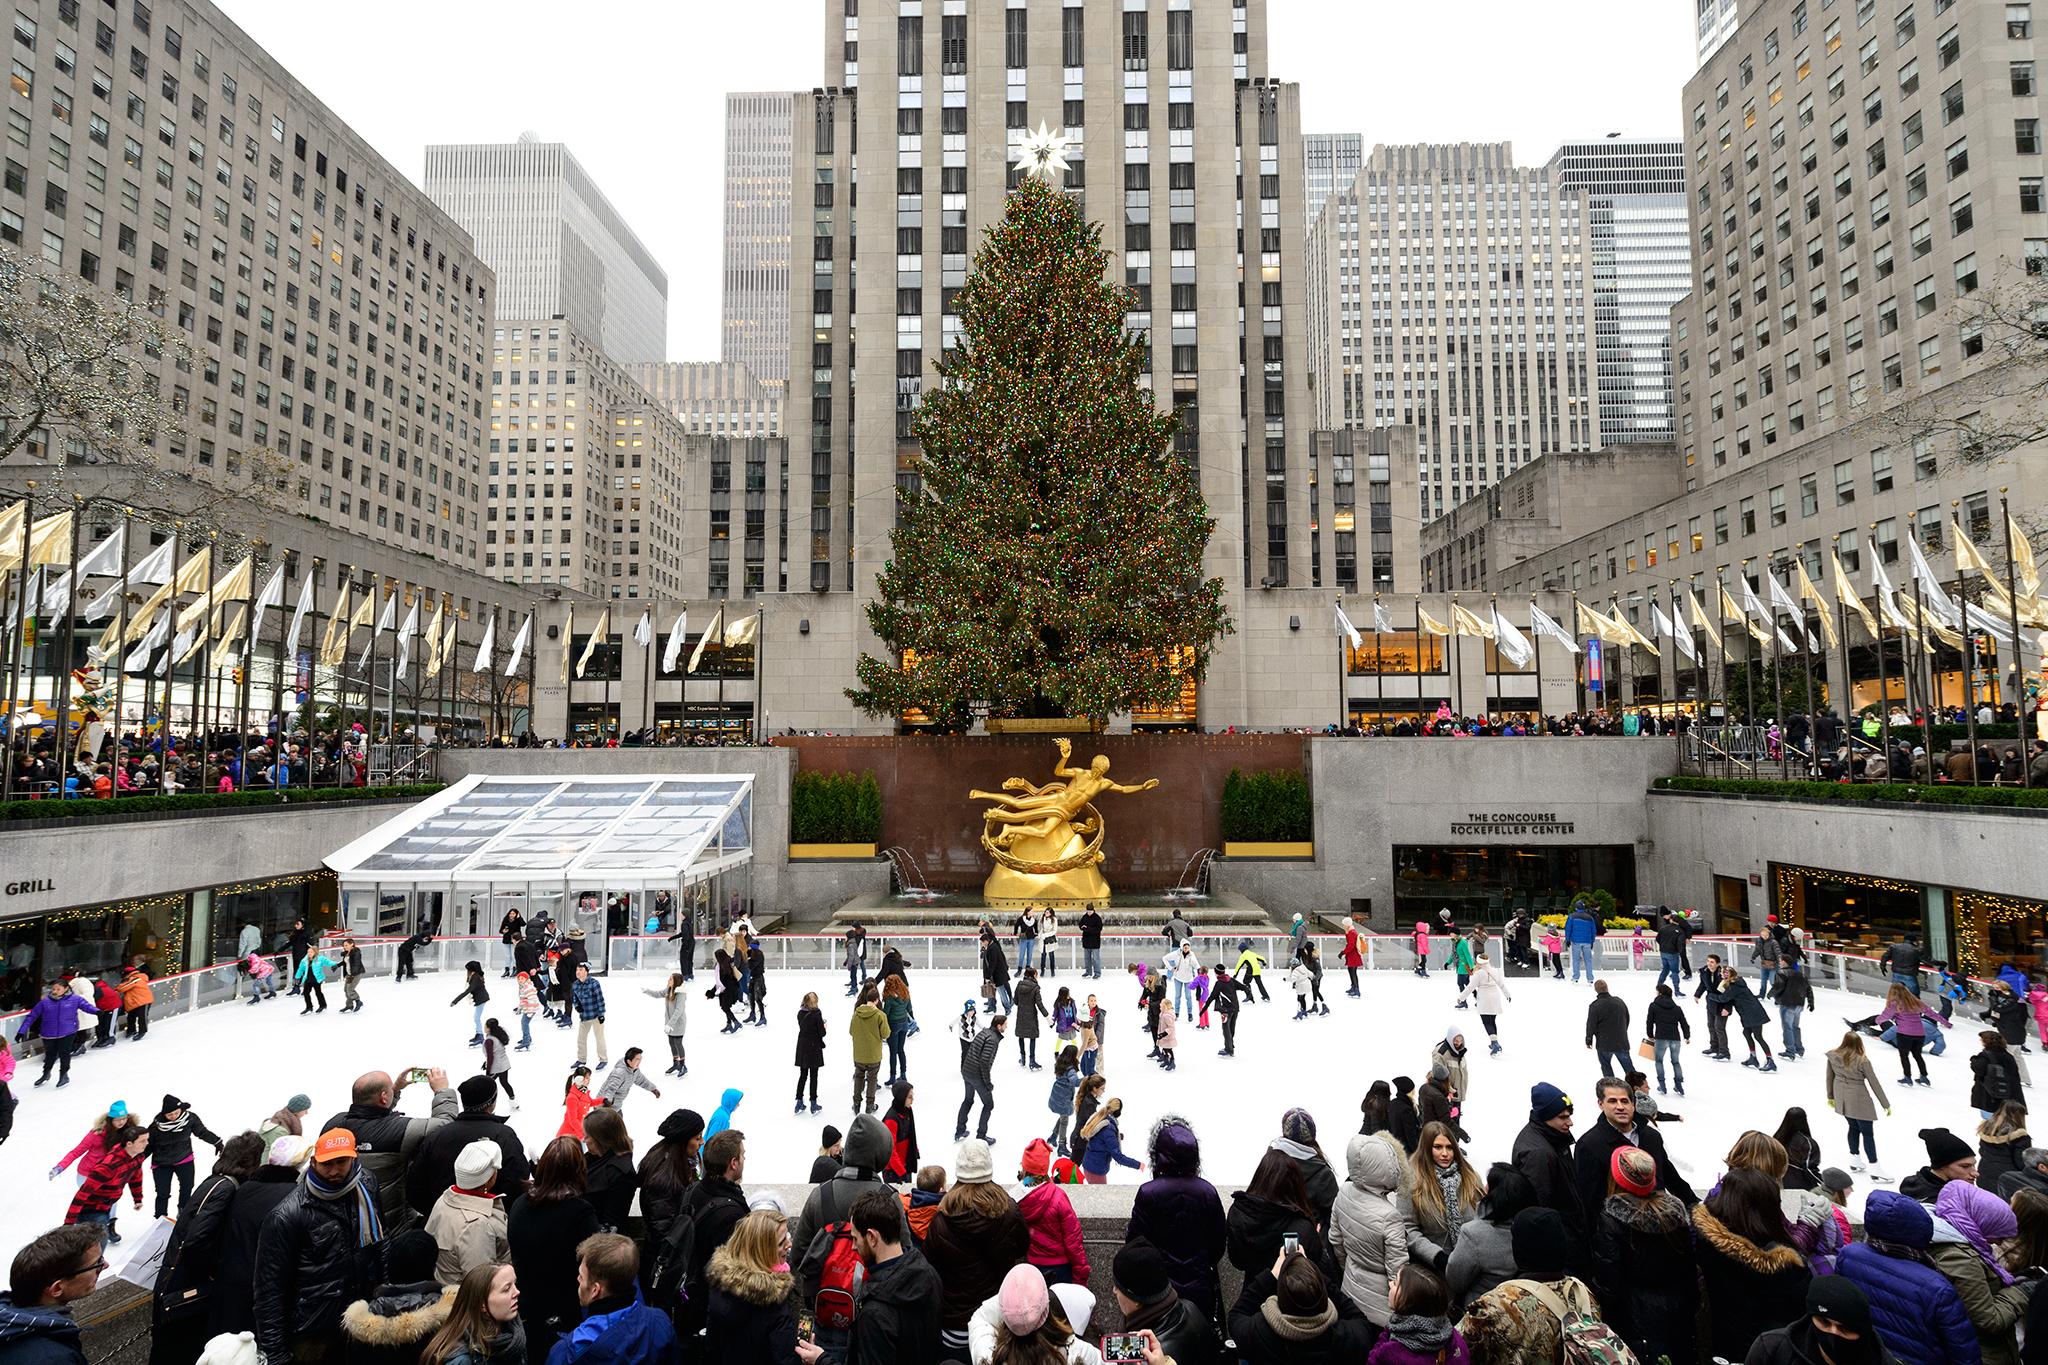 The Rink at Rockefeller Center opens on November 21